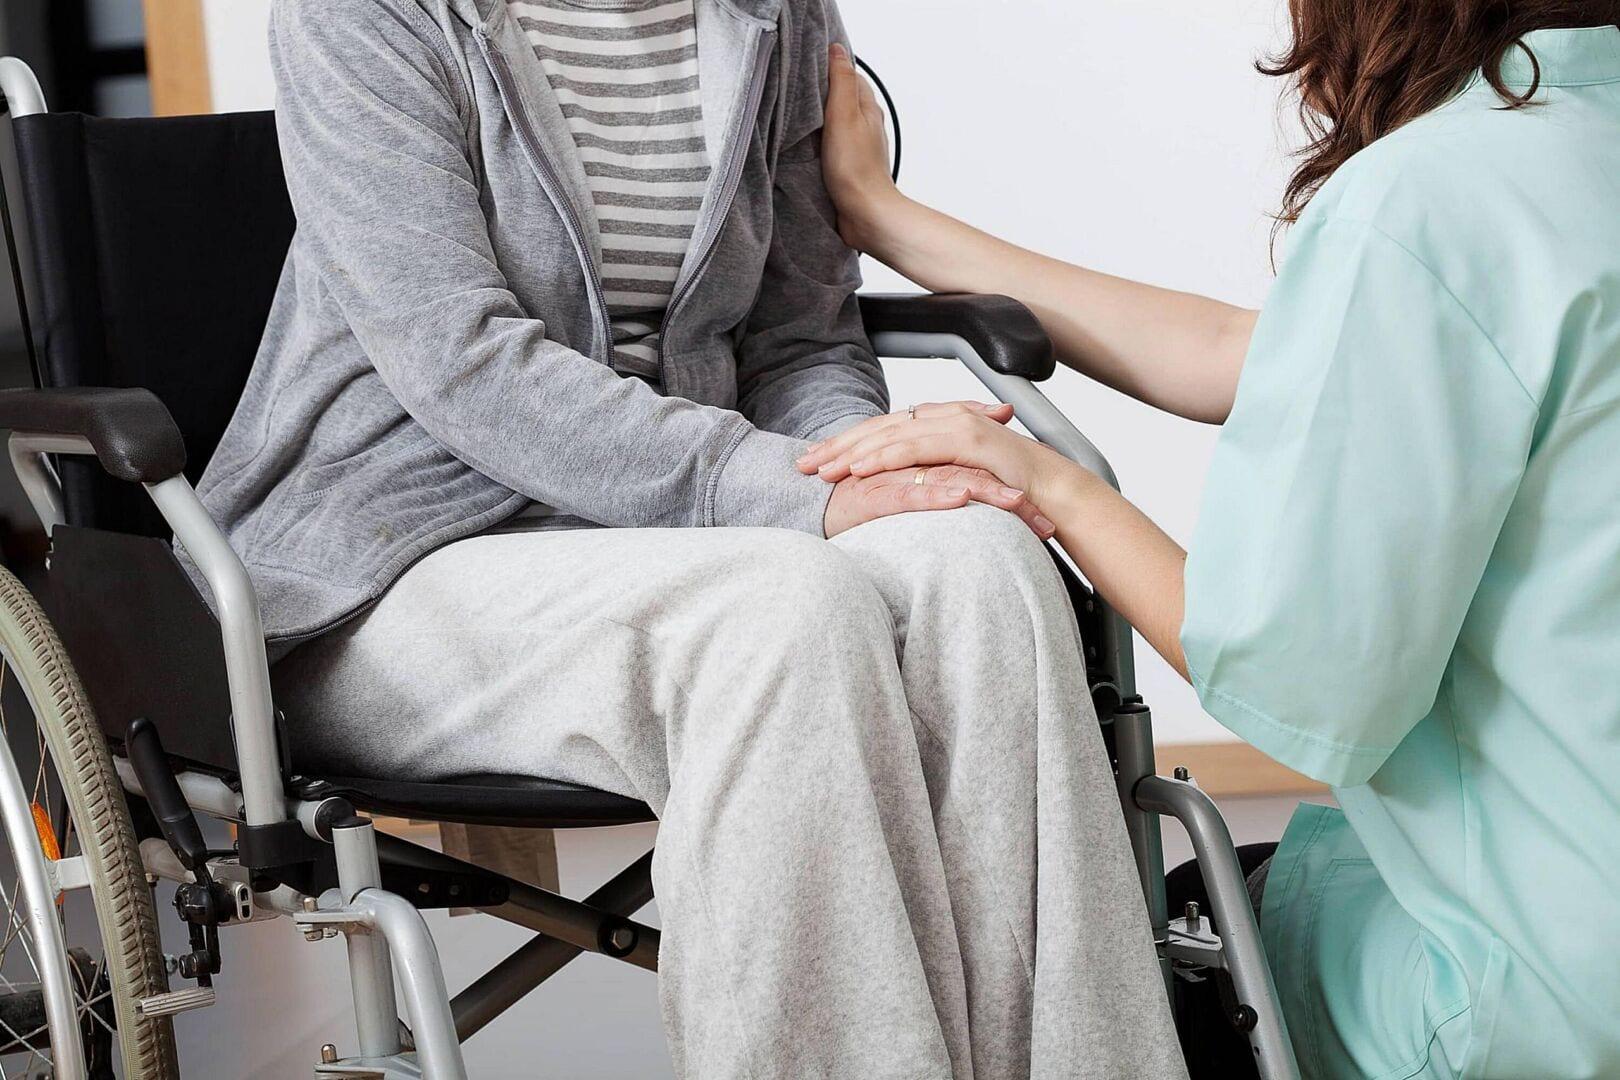 Abilene Nursing Home Abuse & Negligence Lawyer